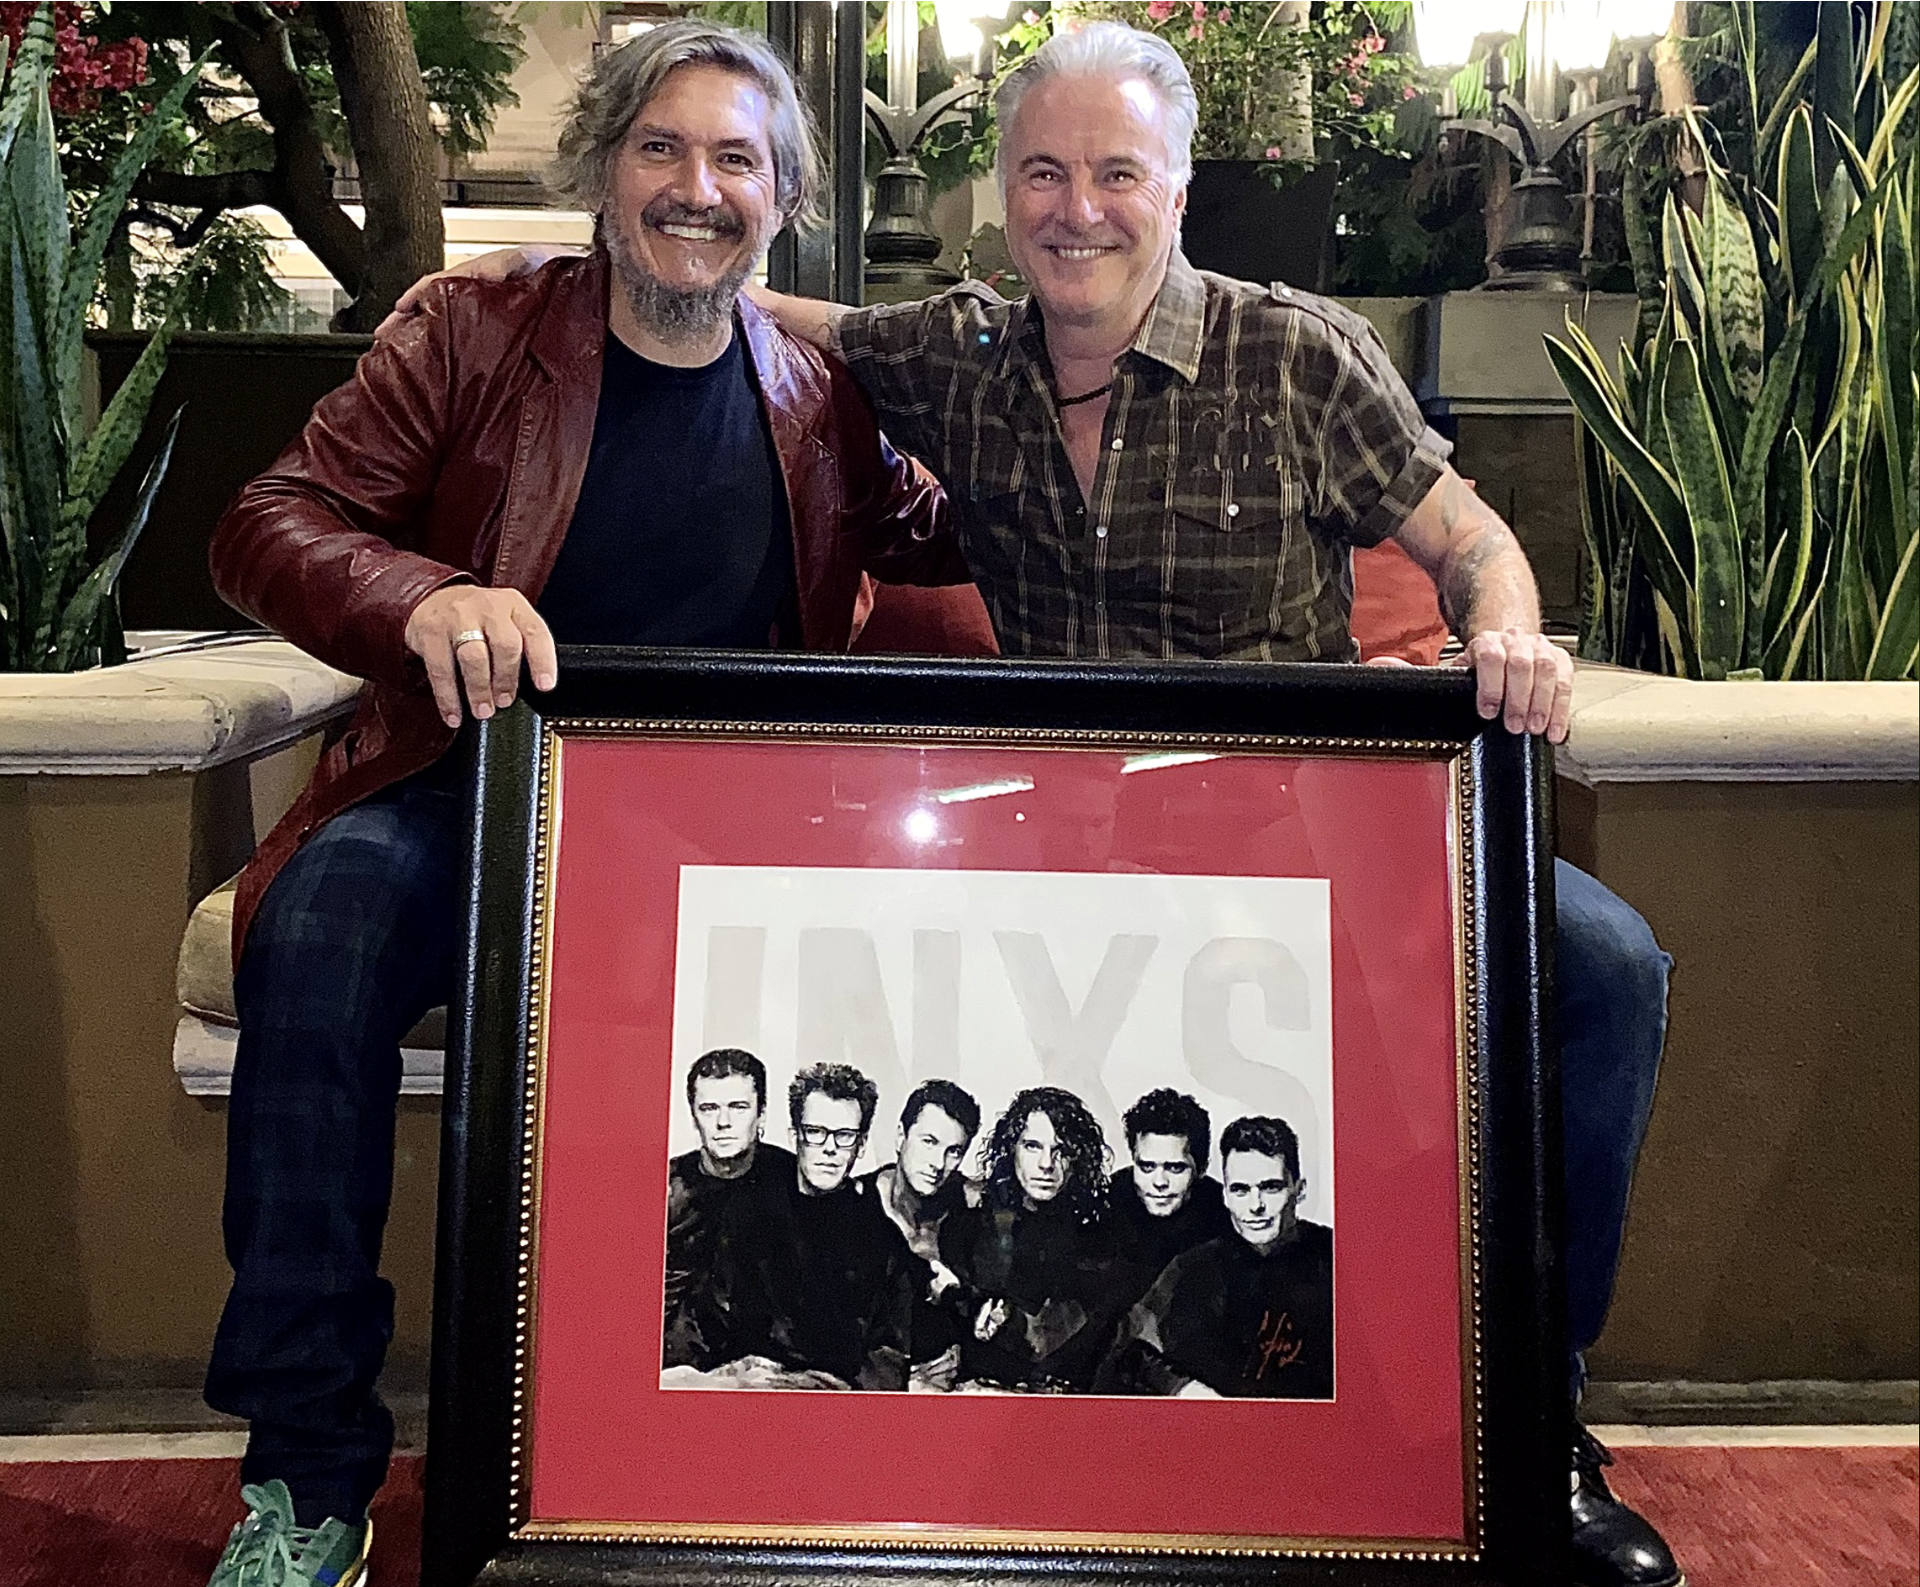 Garry Gary Beers holding portrait next to painter Fabian Perez